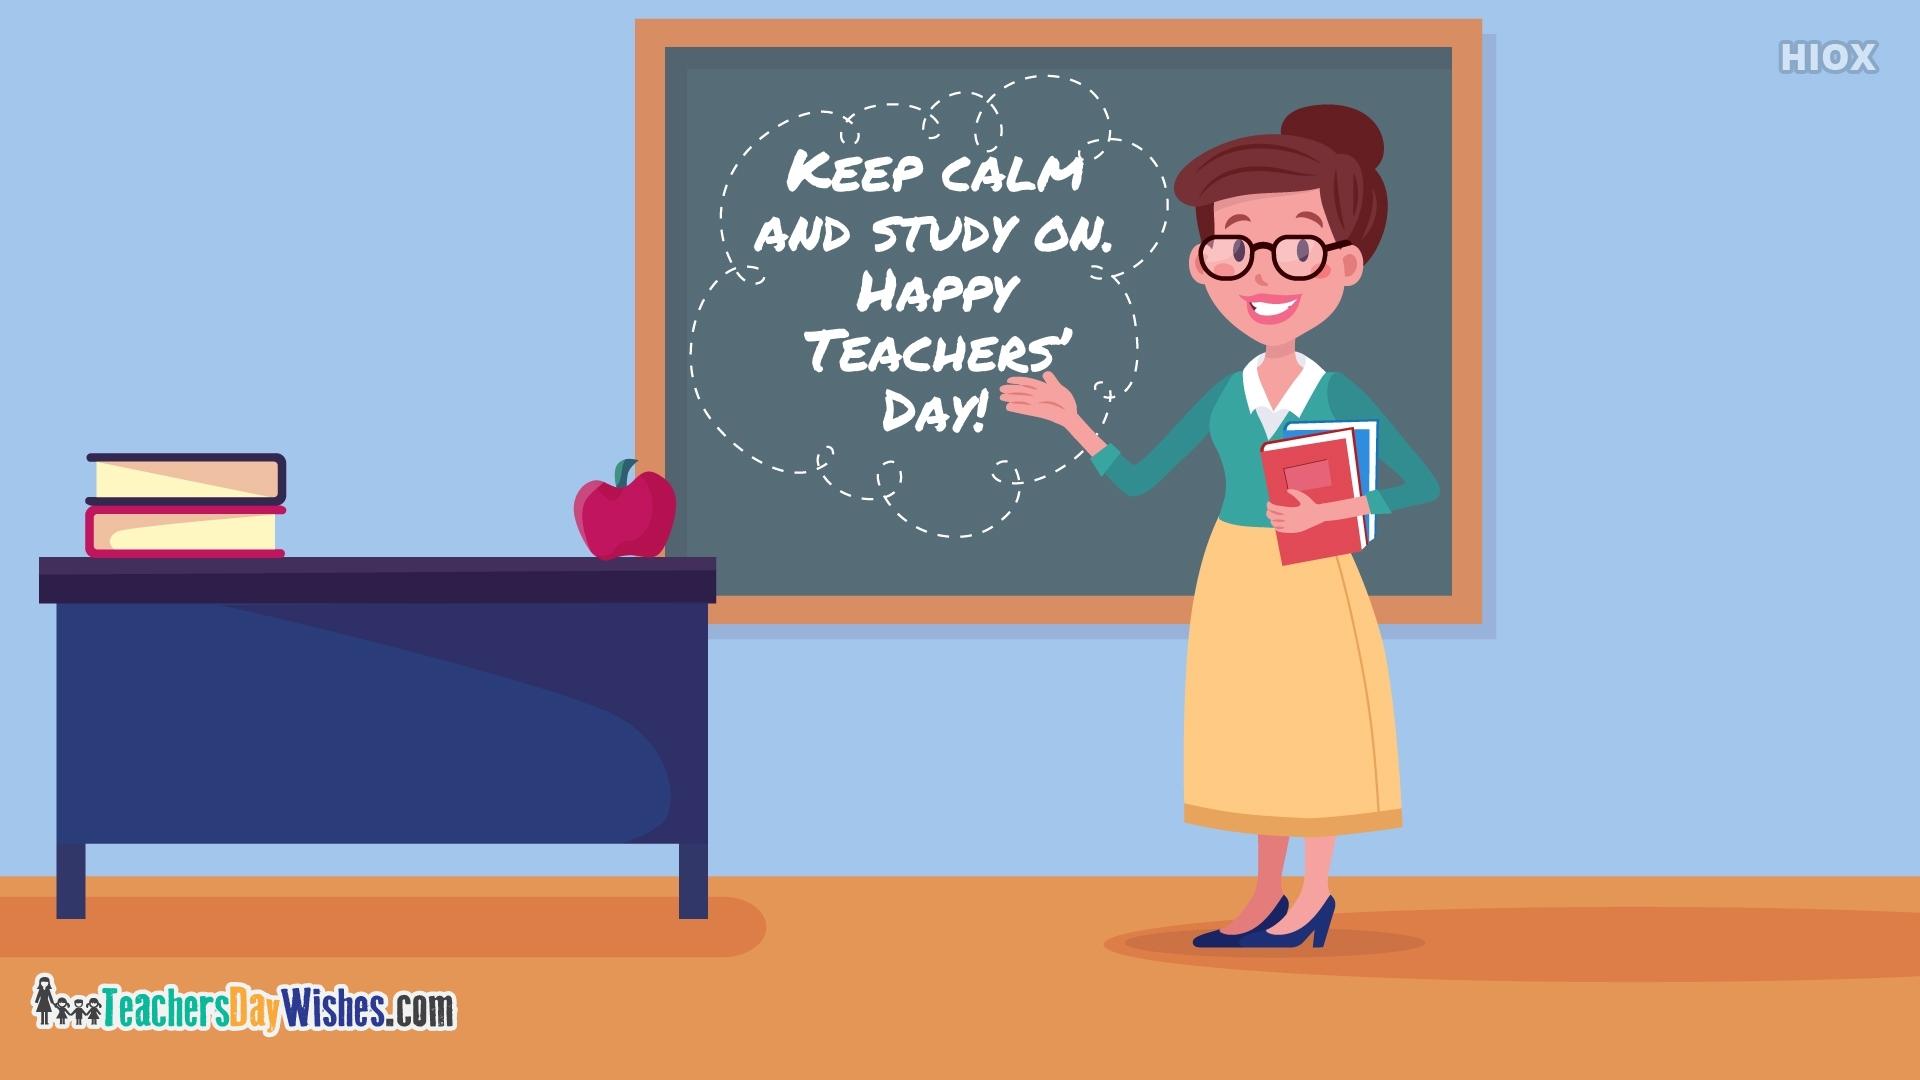 Happy Teachers Day Poster Design